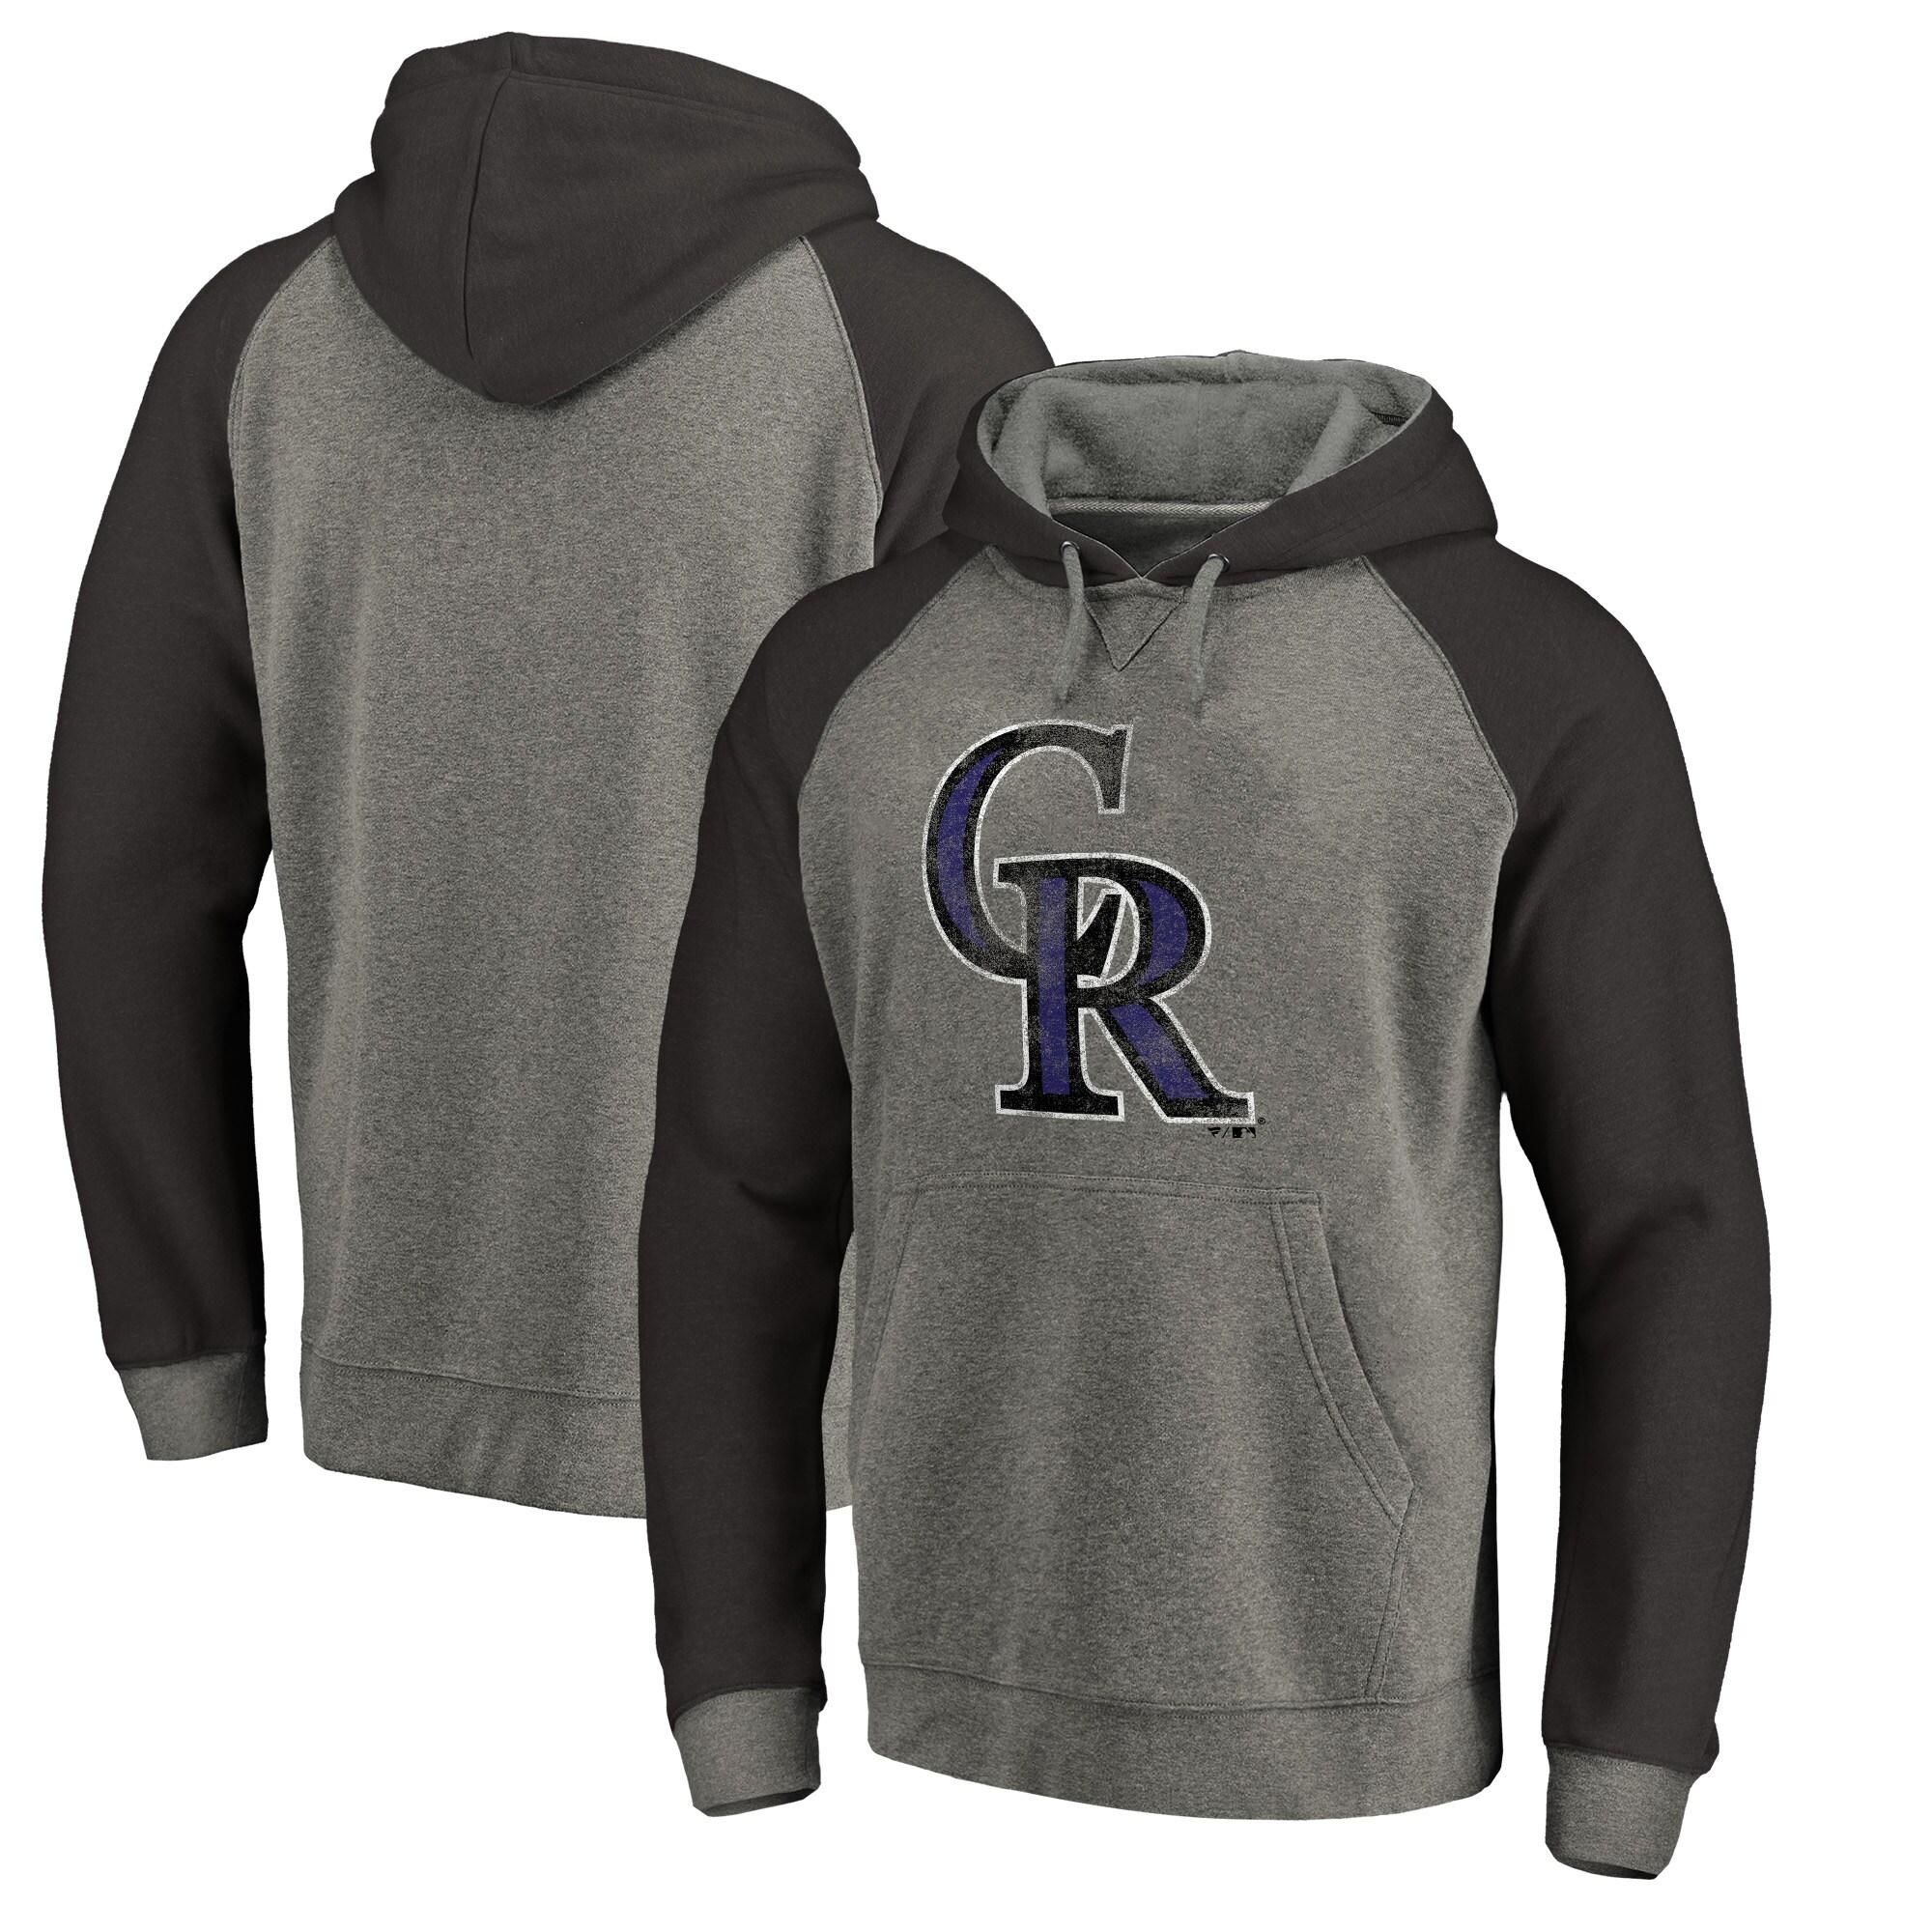 Colorado Rockies Fanatics Branded Distressed Team Logo Tri-Blend Raglan Pullover Hoodie - Gray/Black